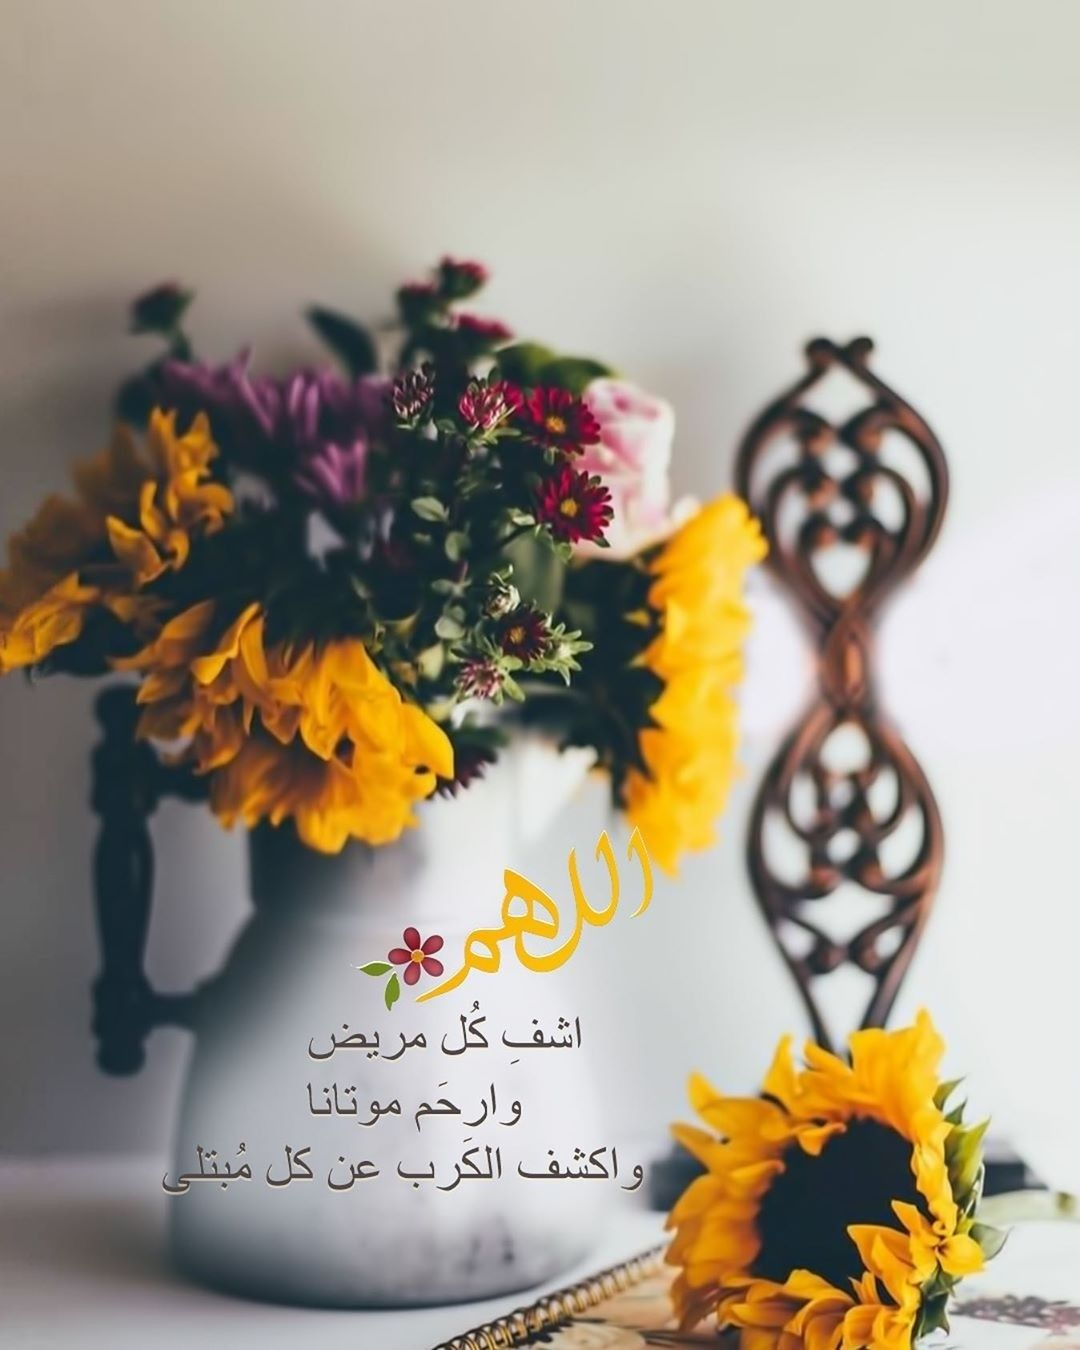 Pin By عبق الورد On أقول حكم ونصائح Crown Jewelry Jewelry Instagram Photo